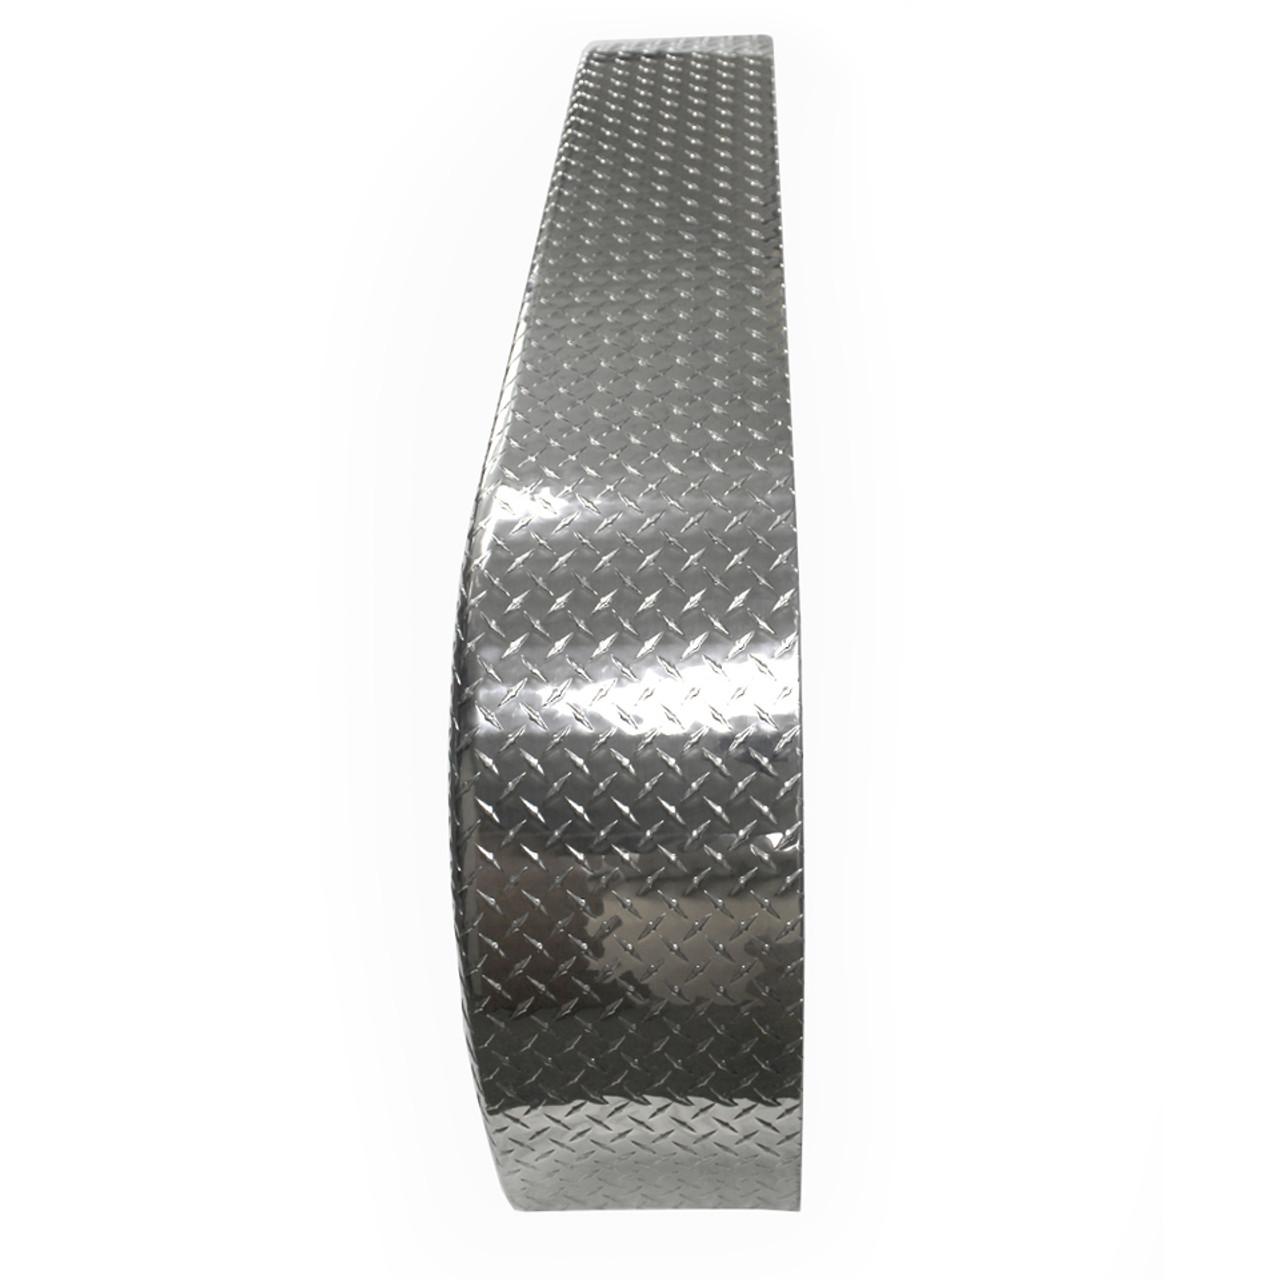 72x9 Tandem Axle Aluminum Tread Plate Trailer Fender top view